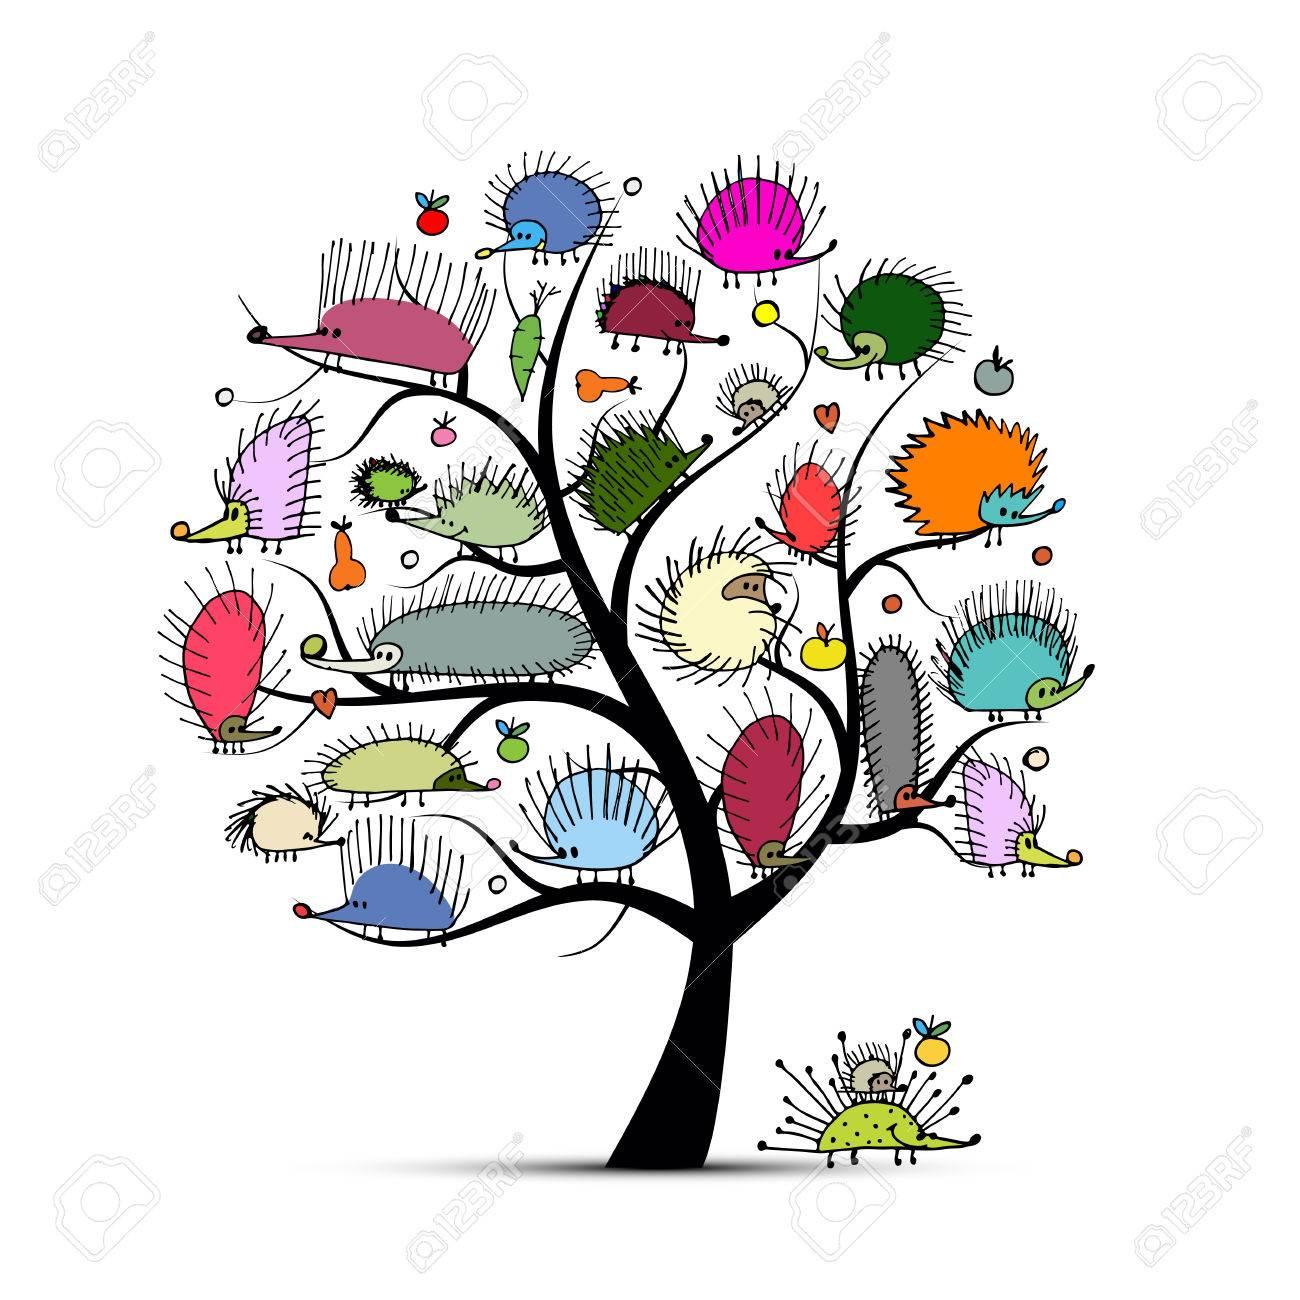 Art tree with funny hedgehog, sketch for your design. illustration - 63269557